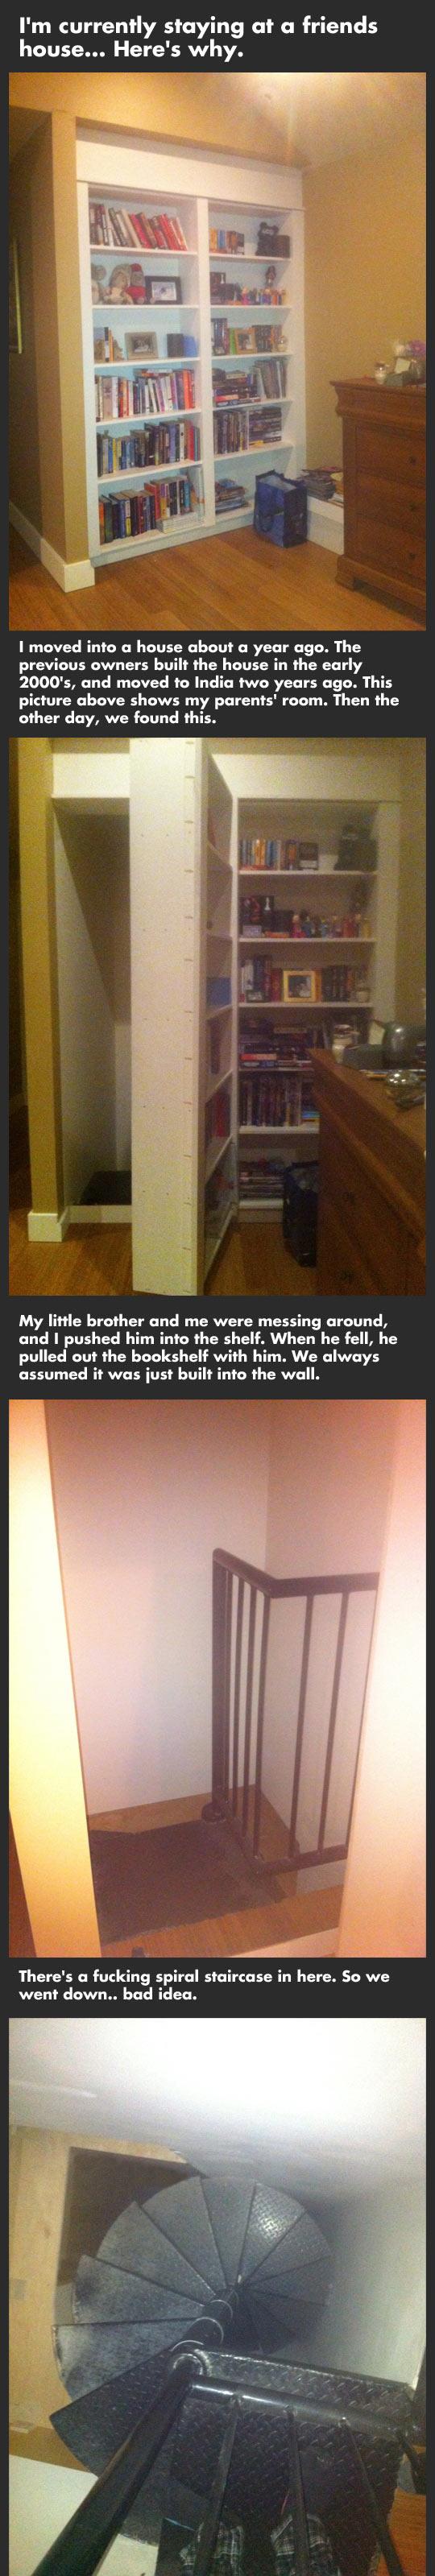 A secret room behind a bookshelf is cool until...